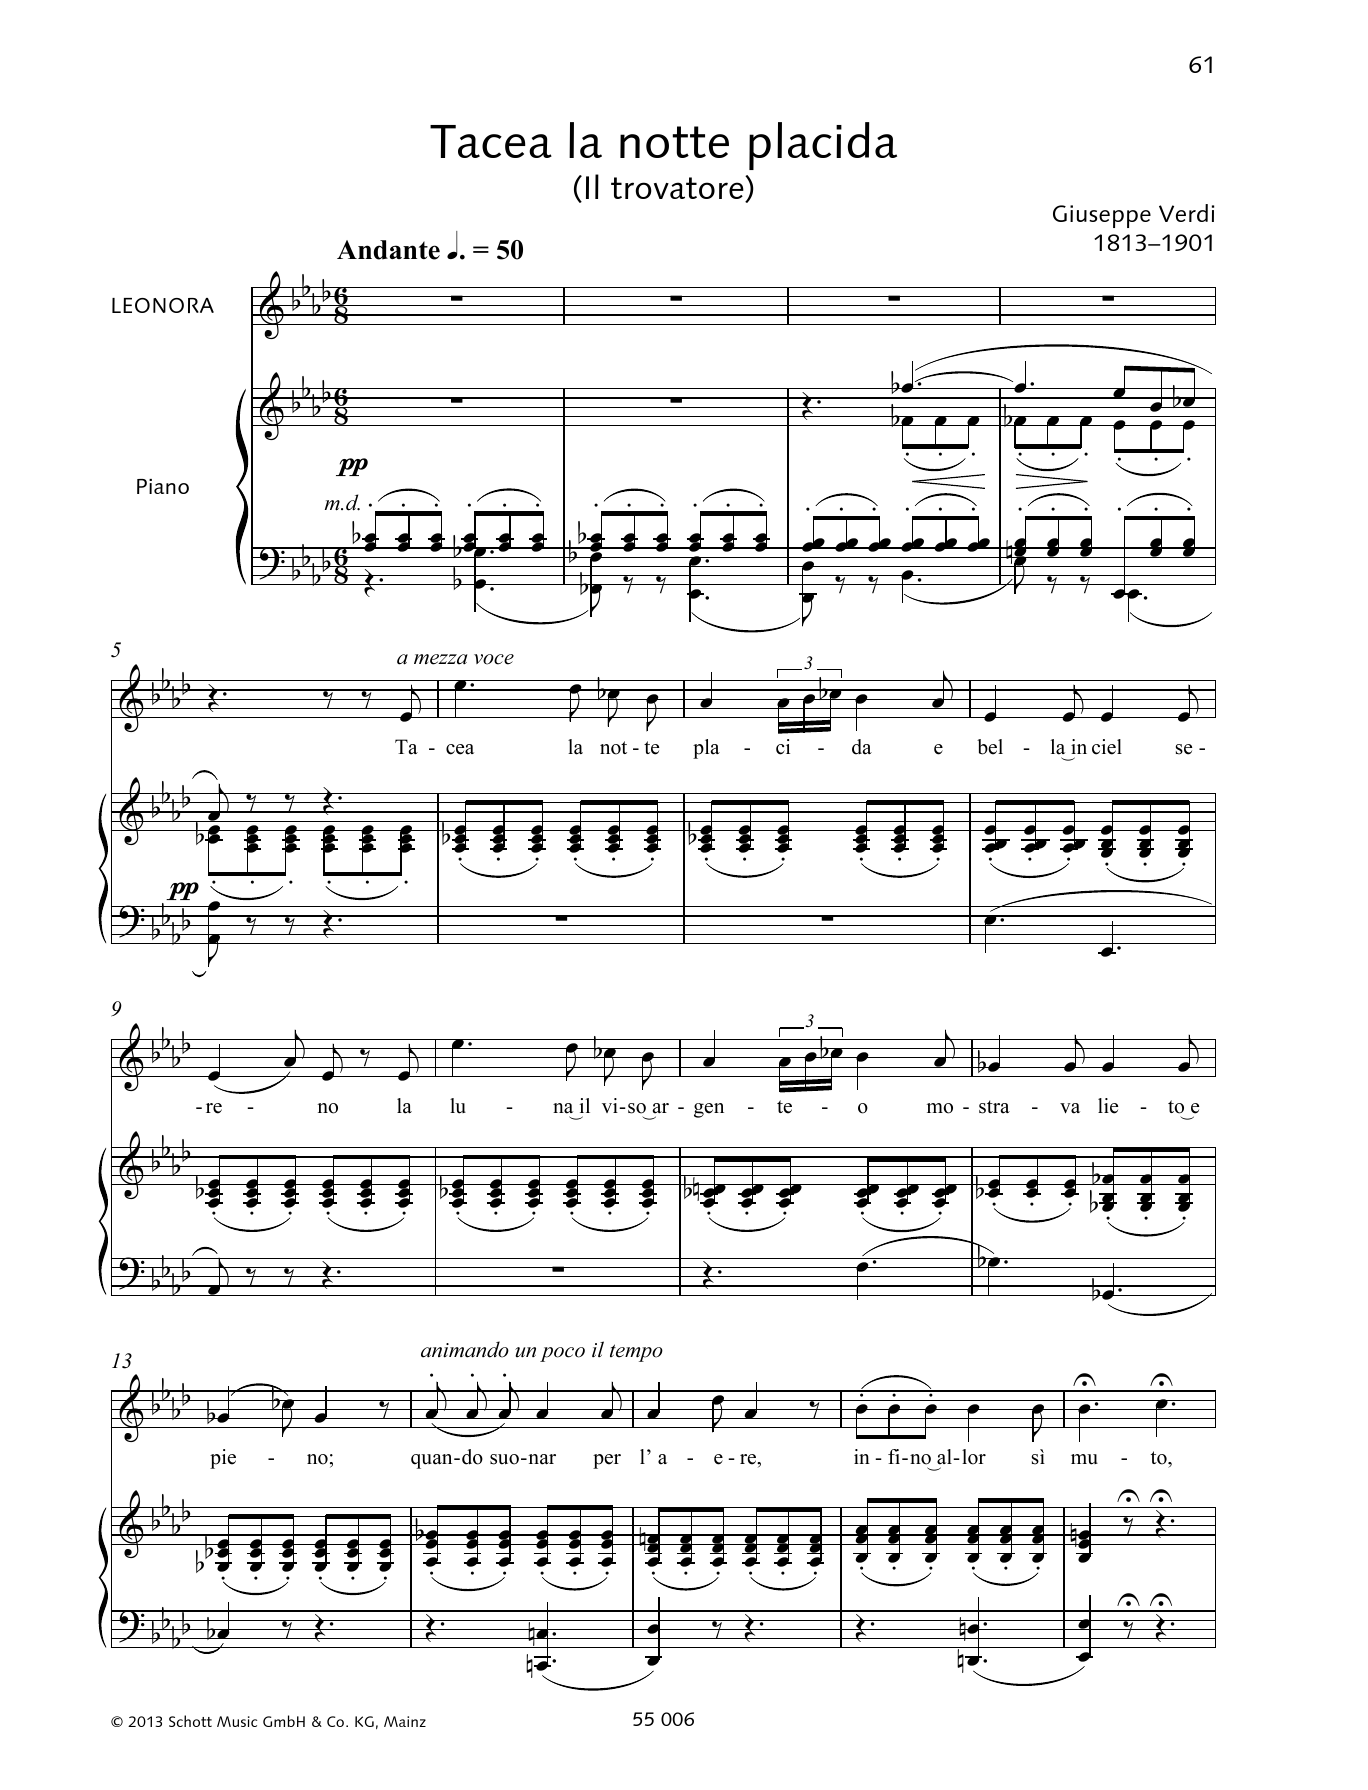 Tacea la notte placida Sheet Music